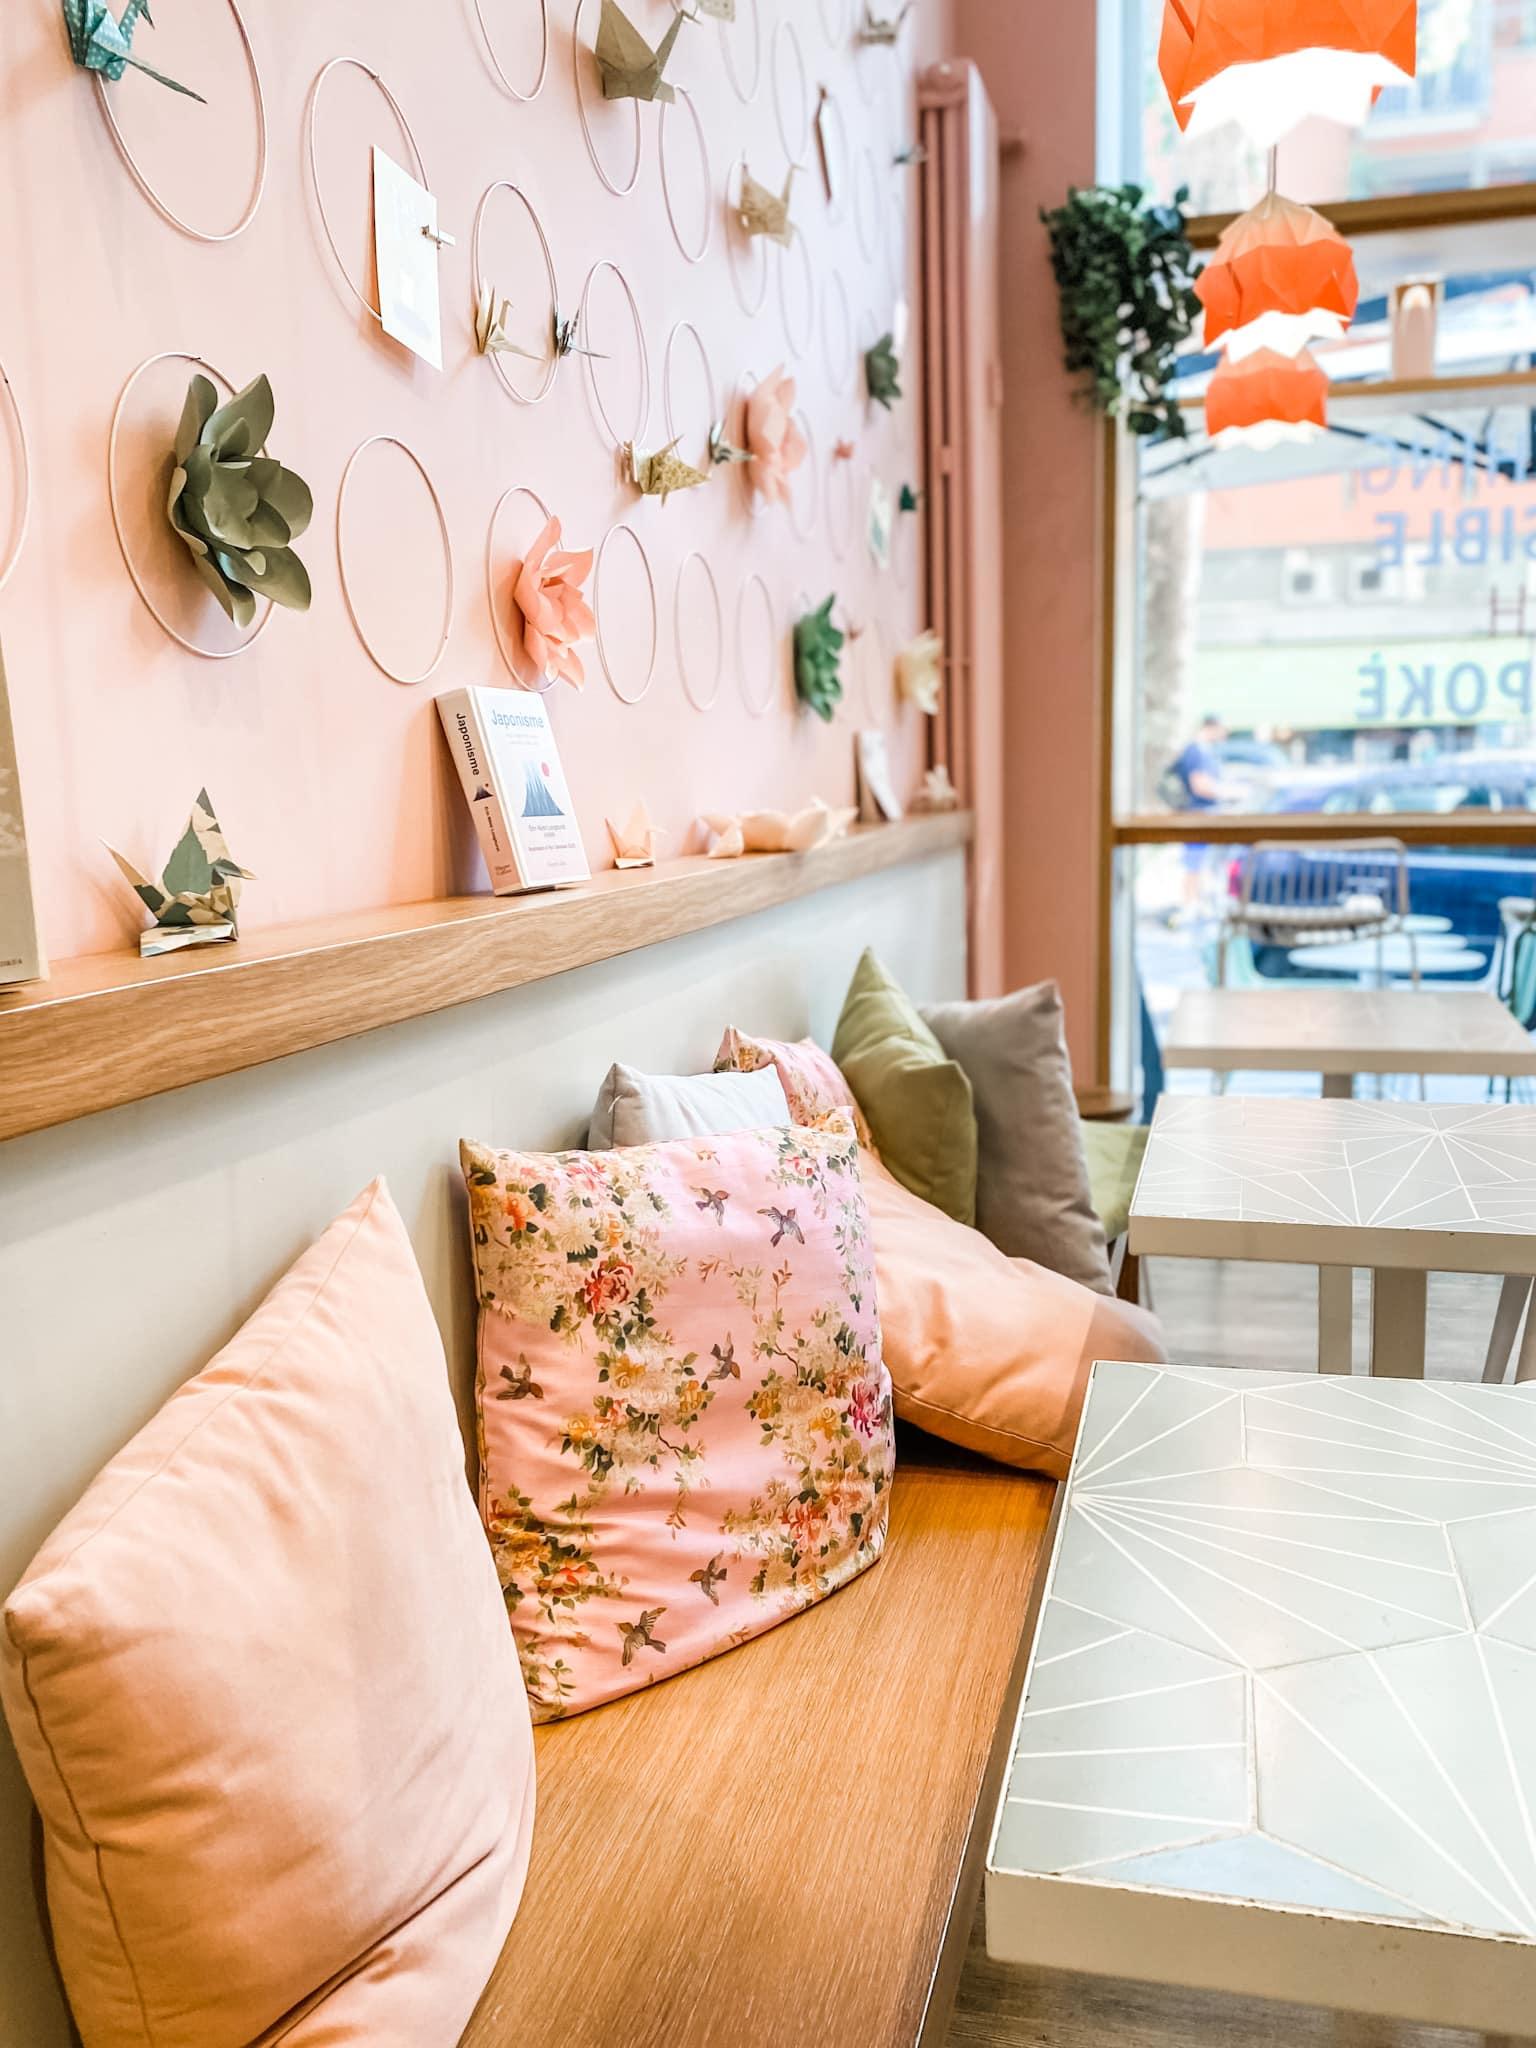 Macha Cafe i Milano Instagram beste bilder